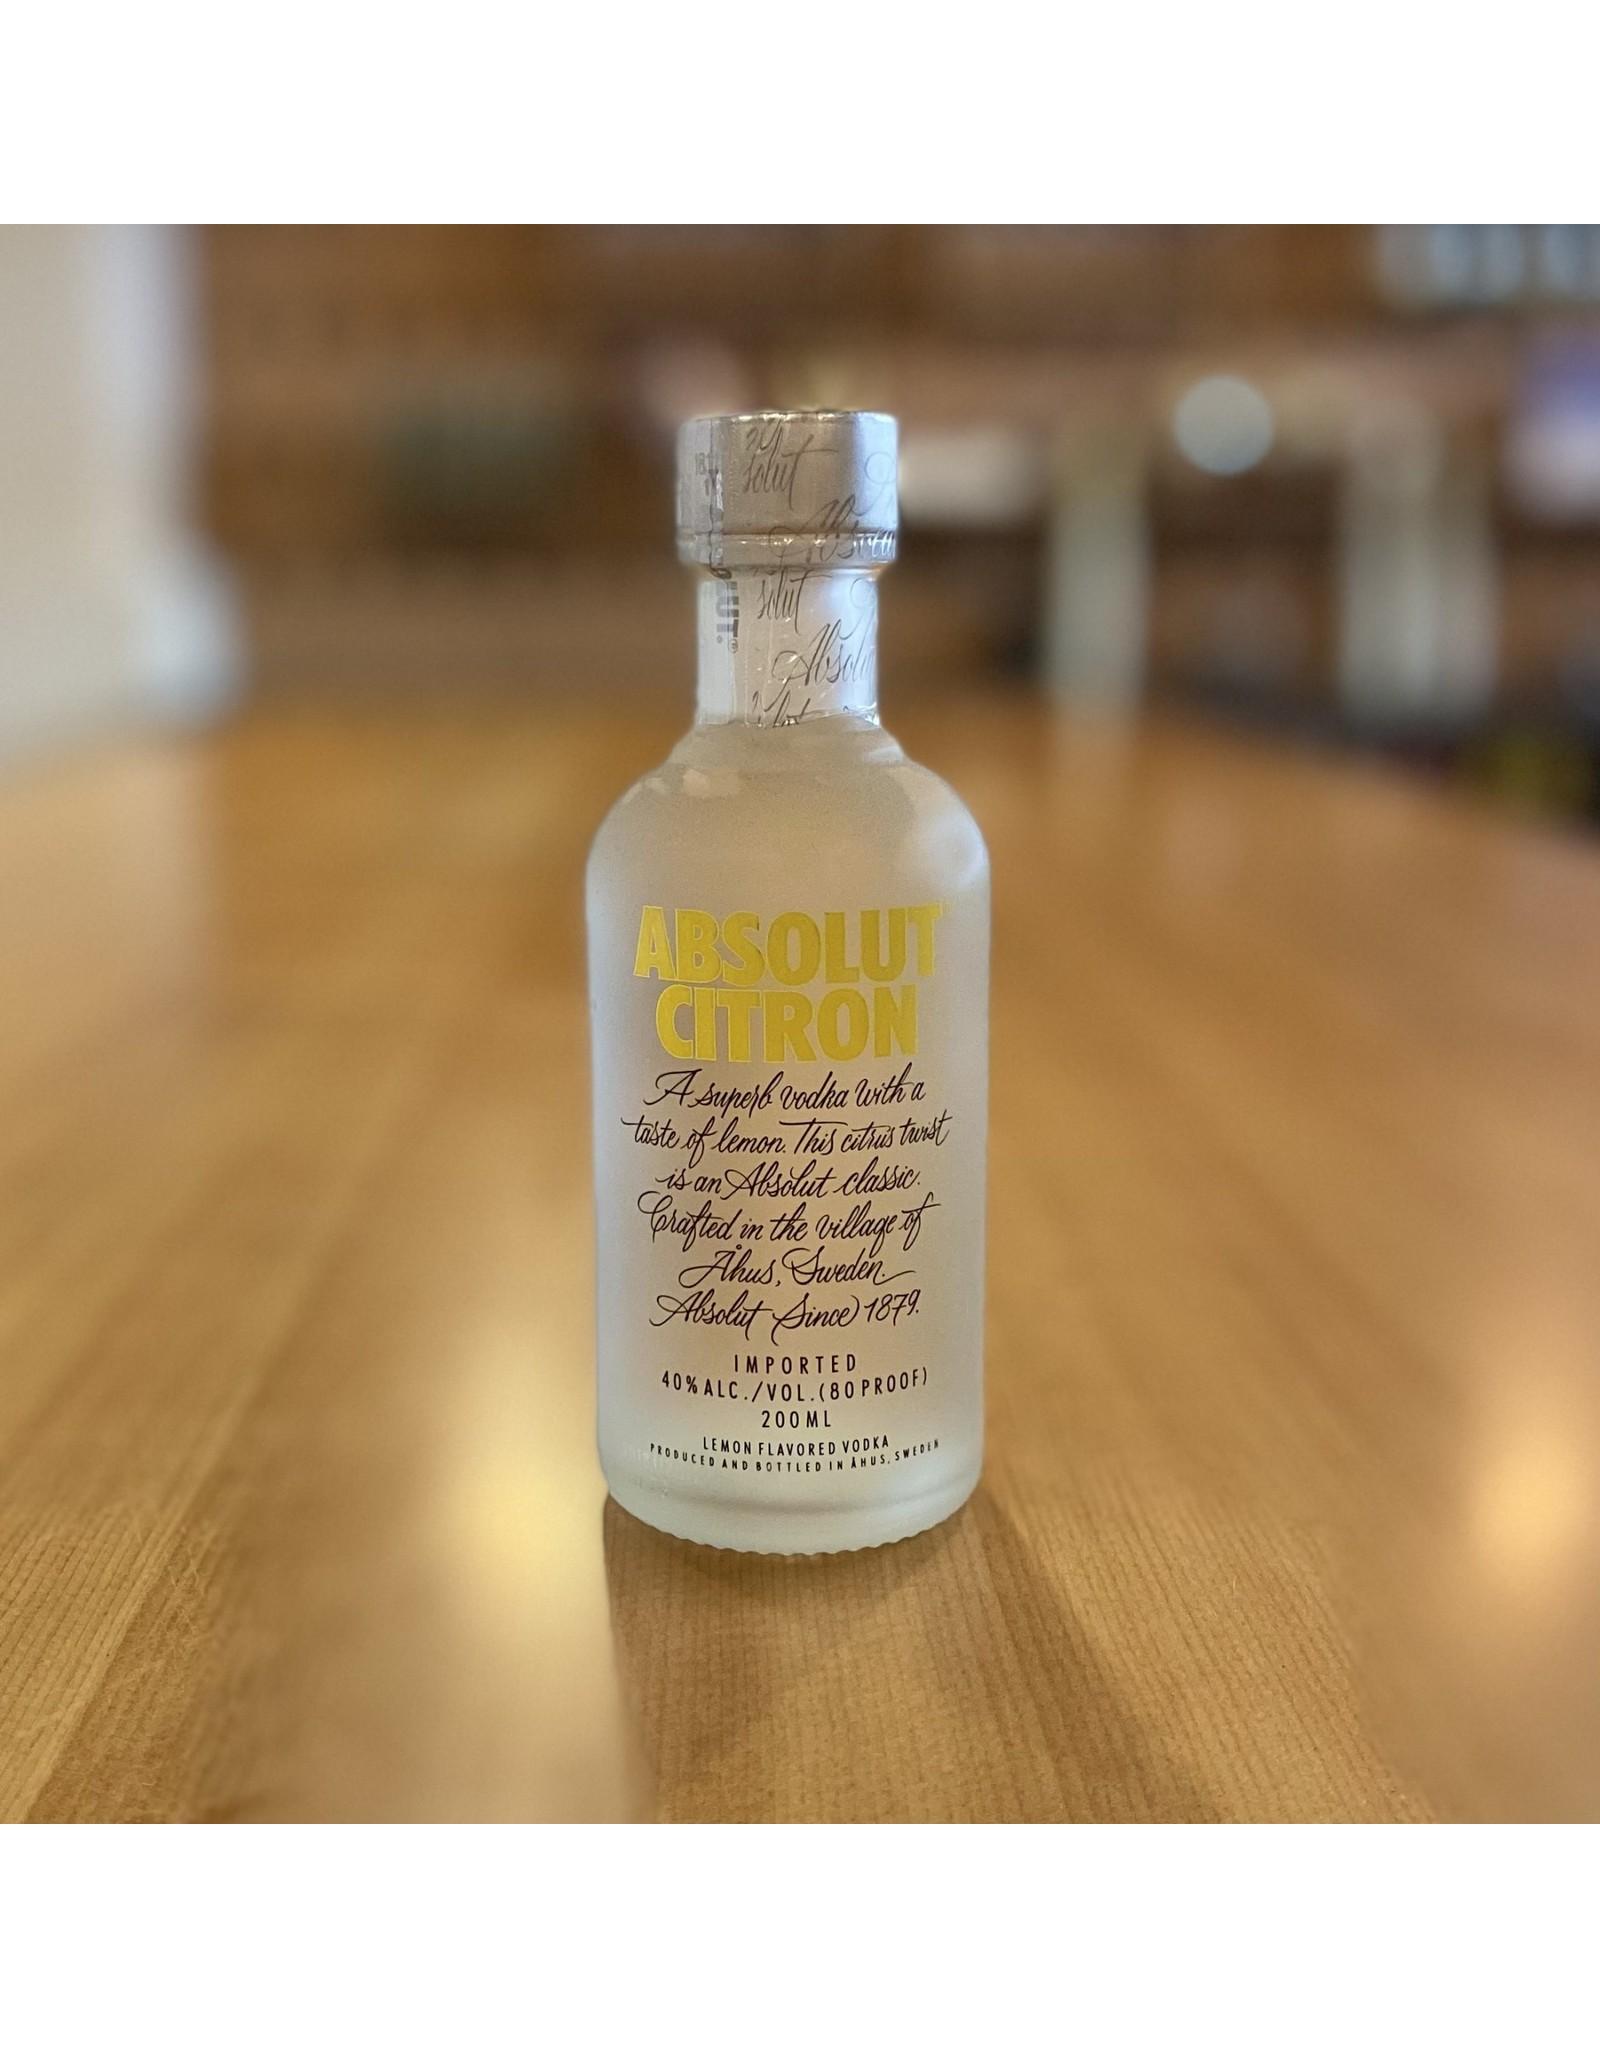 Absolut Citron Vodka 200ml - Sweden